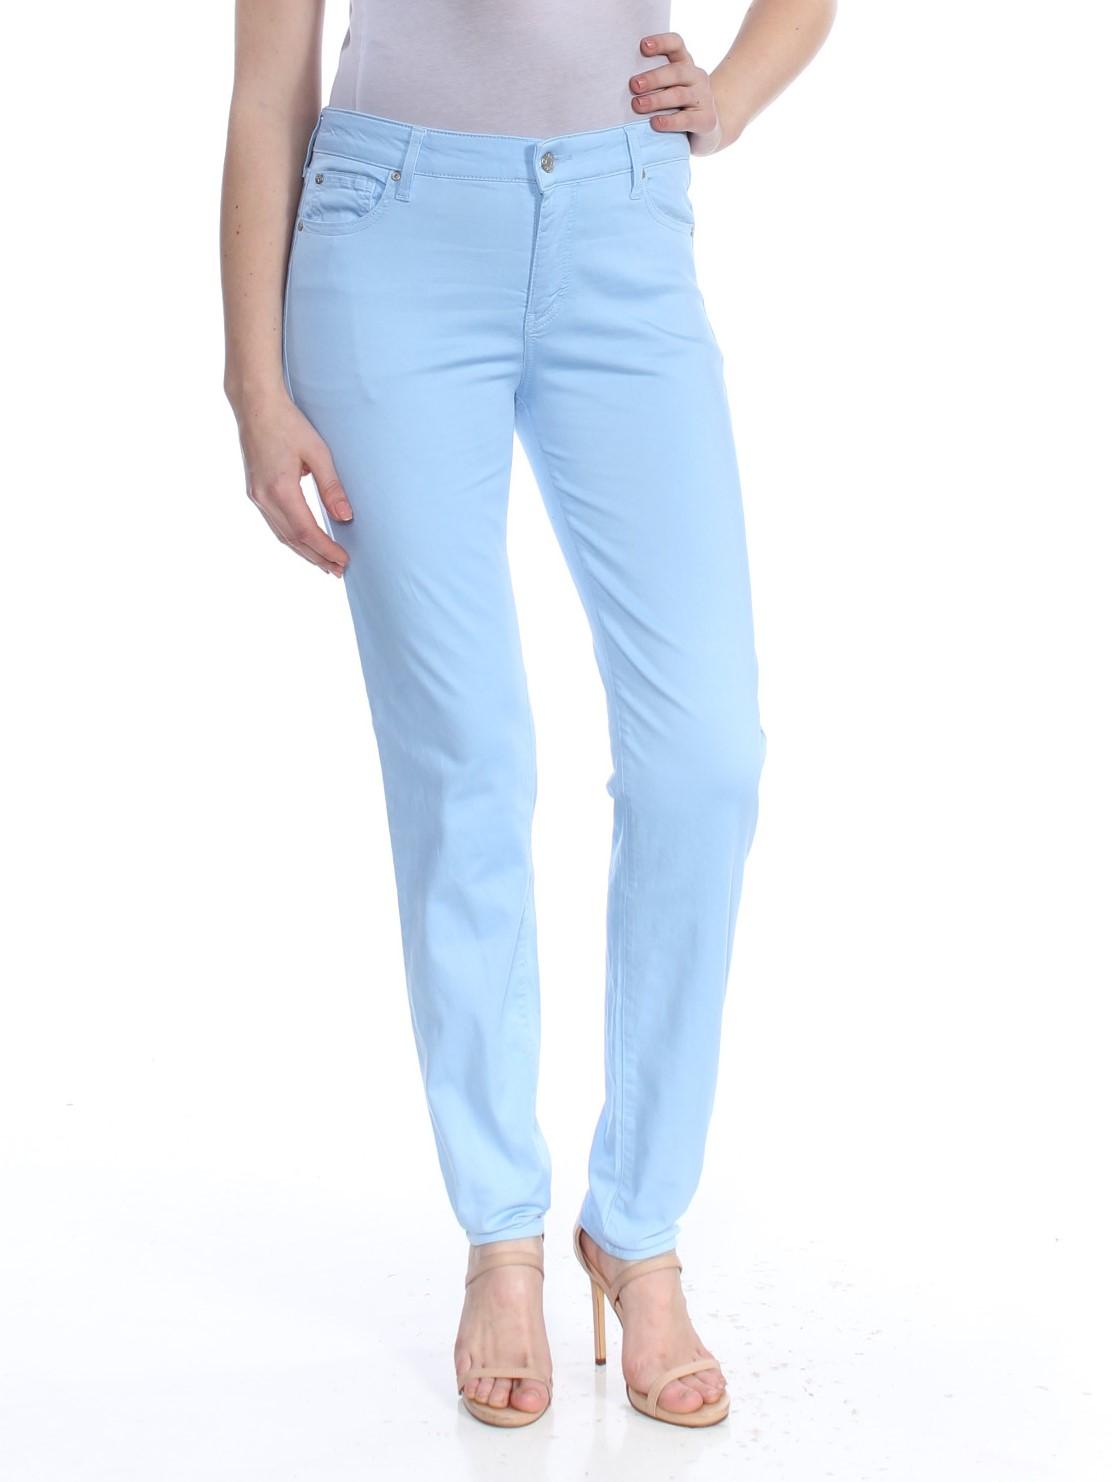 CELEBRITY PINK Womens Light Blue Skinny Pants Juniors  Size: 11